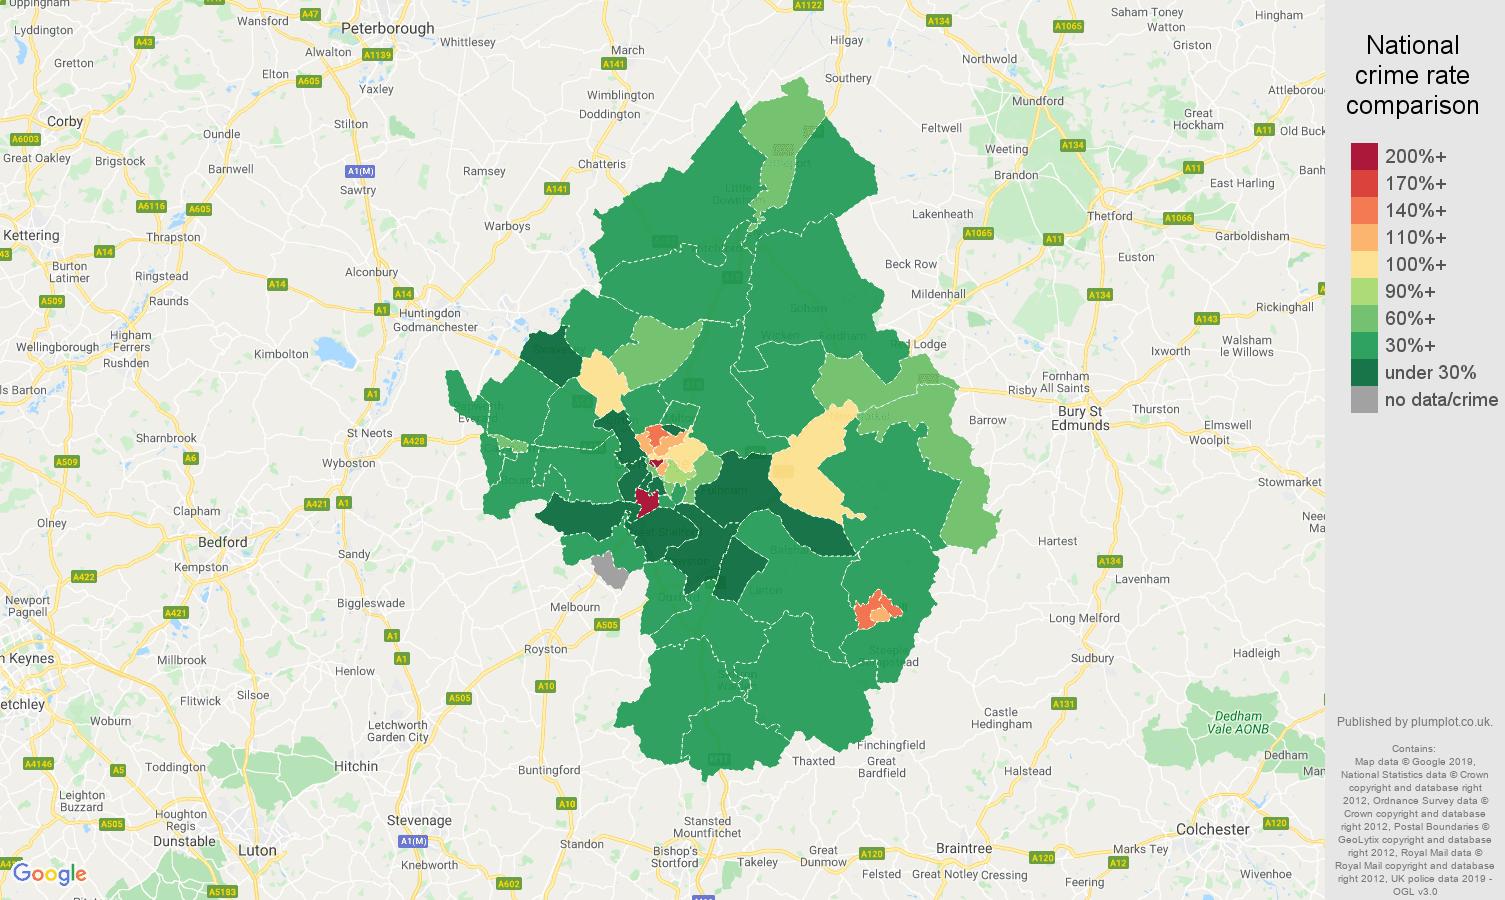 Cambridge public order crime rate comparison map